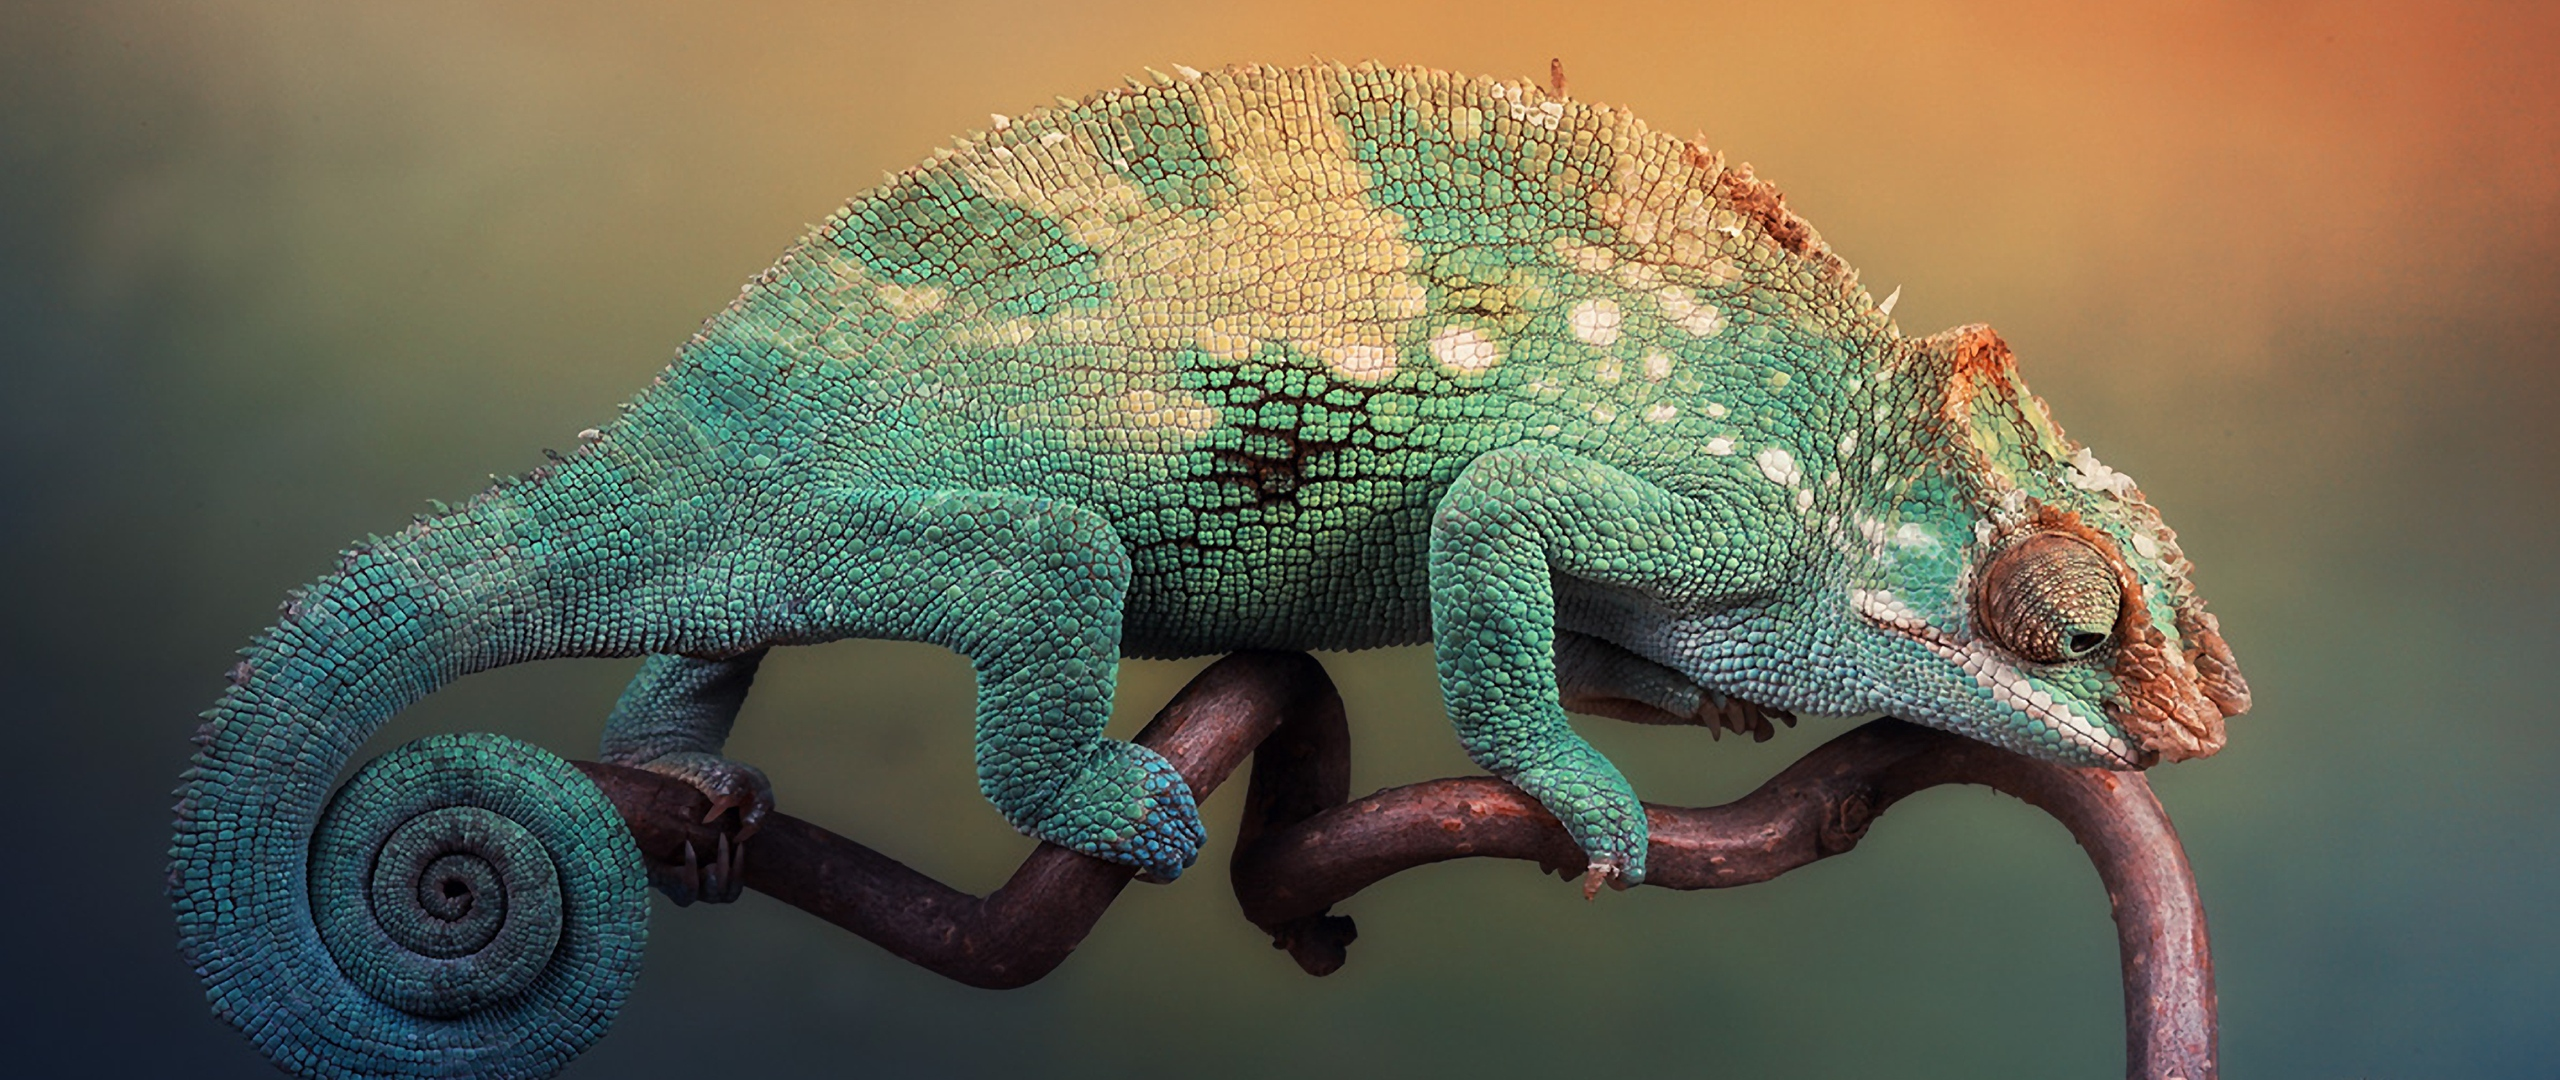 Wallpaper 2560x1080 chameleon handsome lizard branch sit 2560x1080 2560x1080